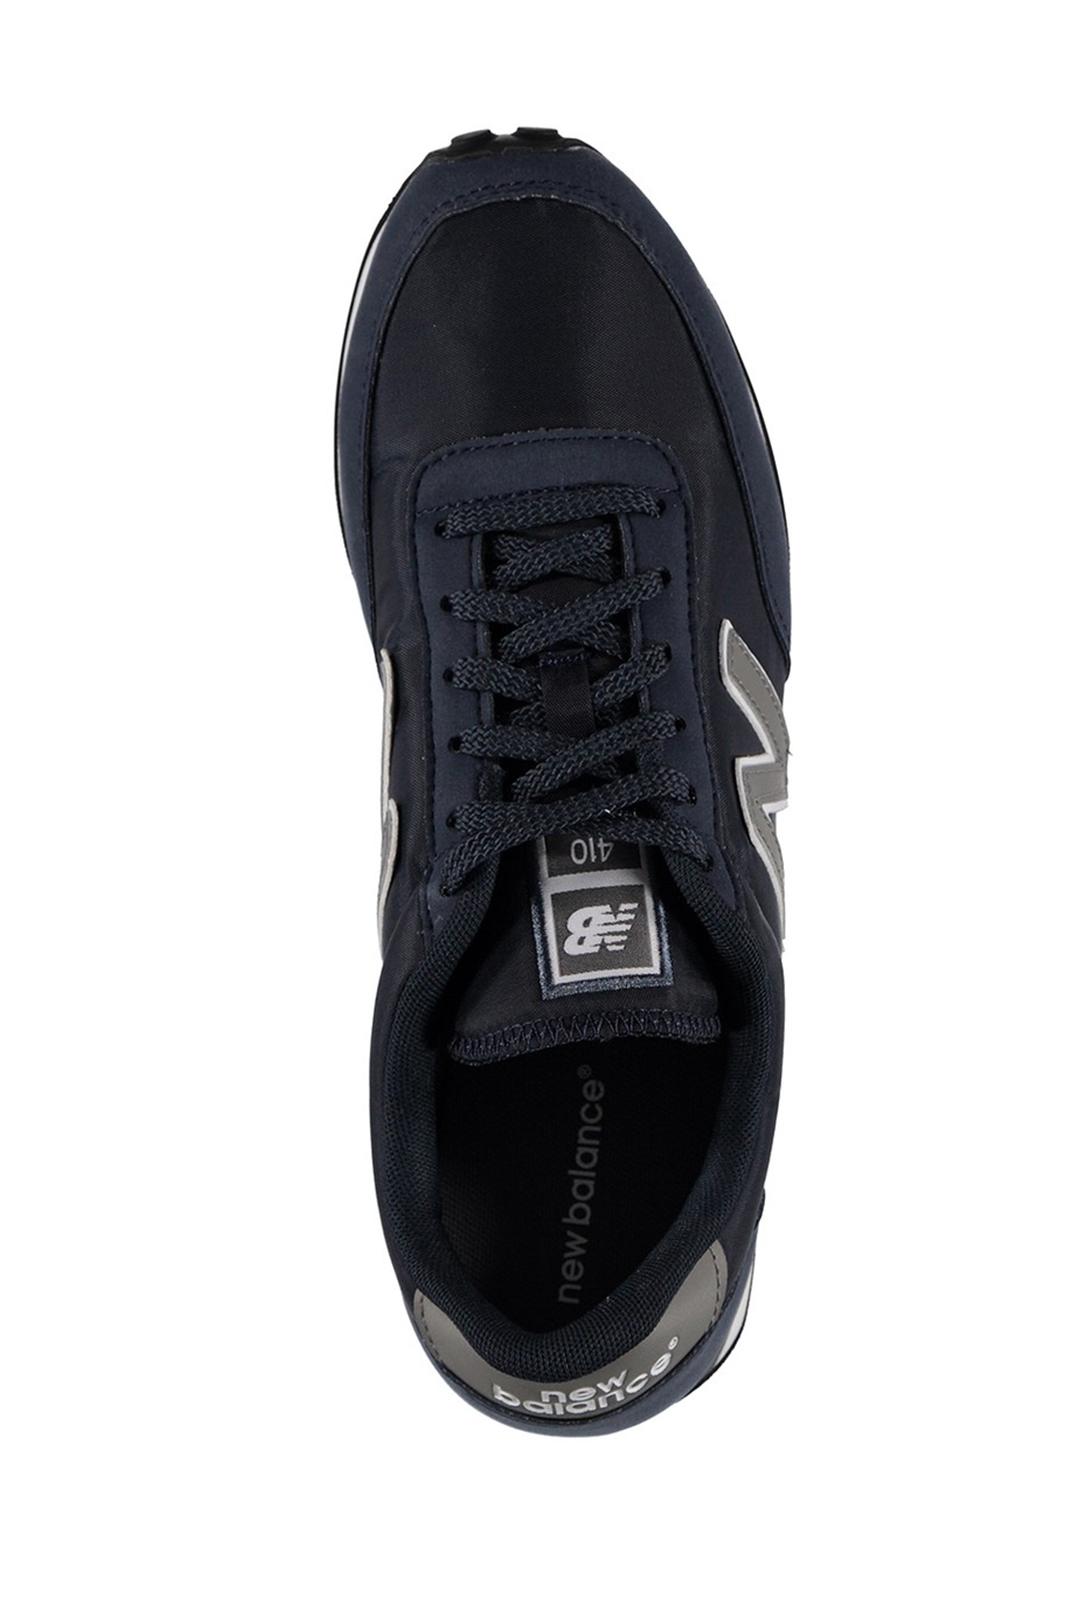 Chaussures   New balance U410CB CB